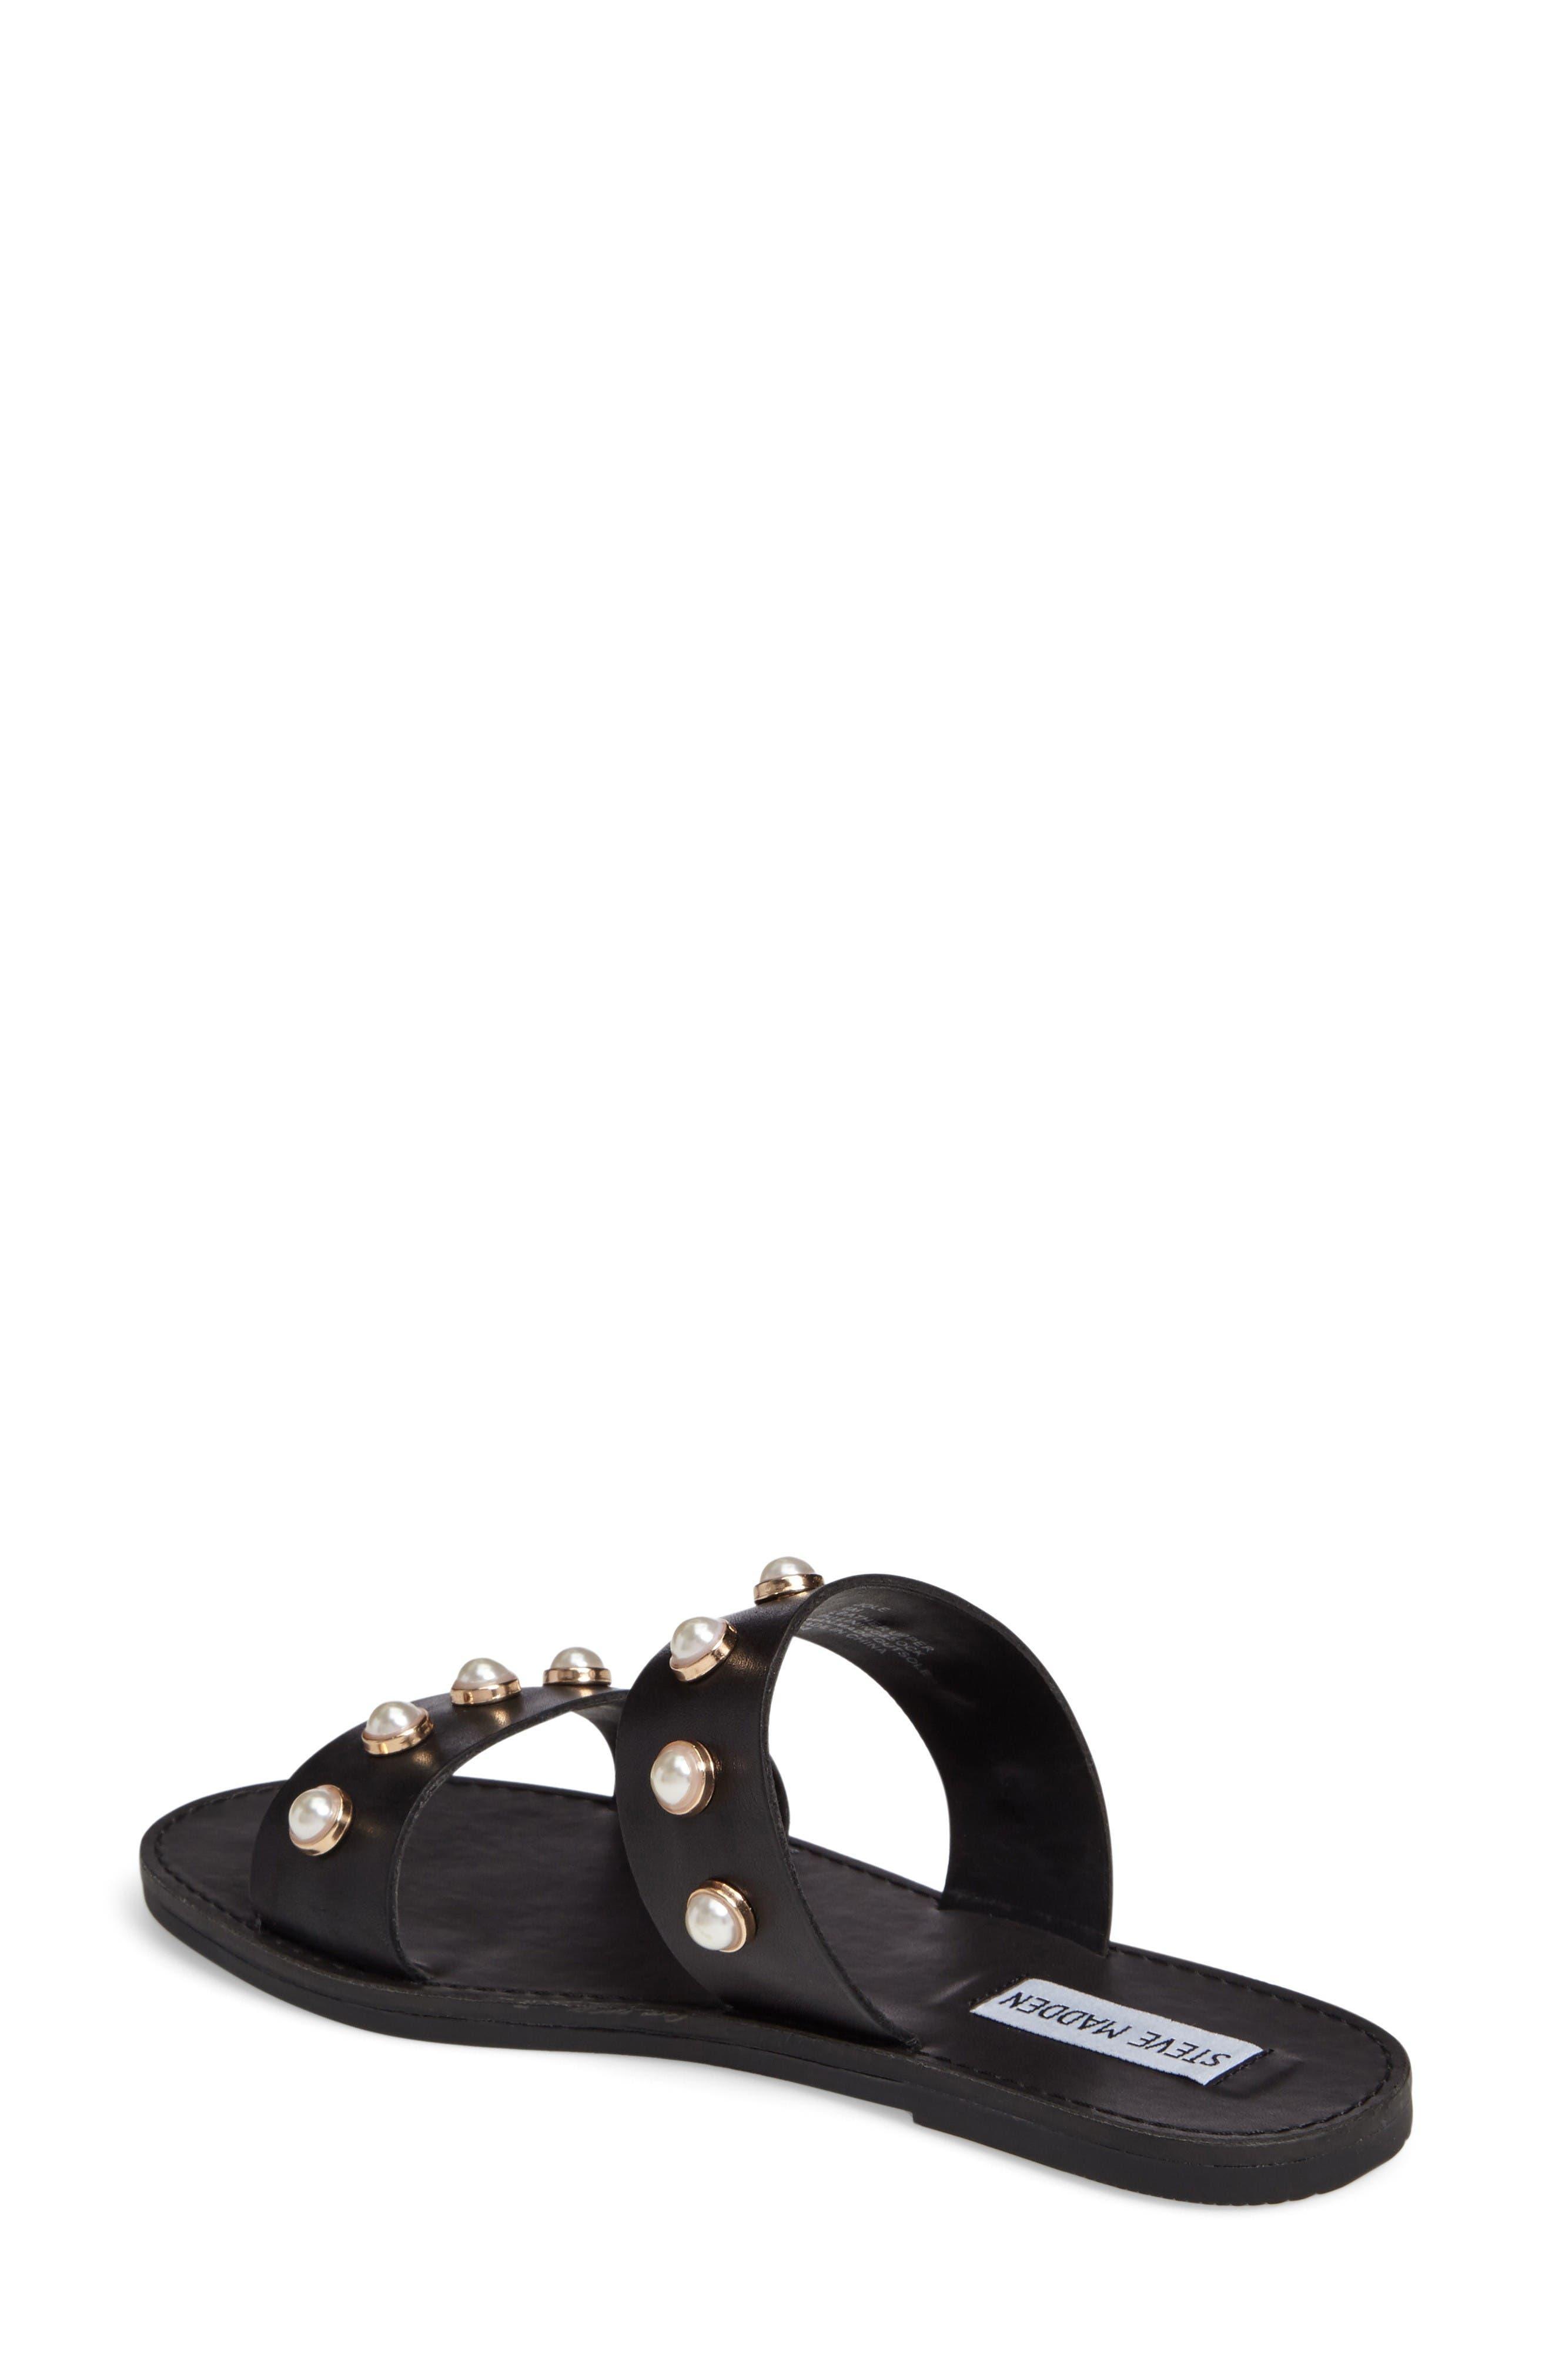 Alternate Image 2  - Steve Madden Jole Embellished Slide Sandal (Women)